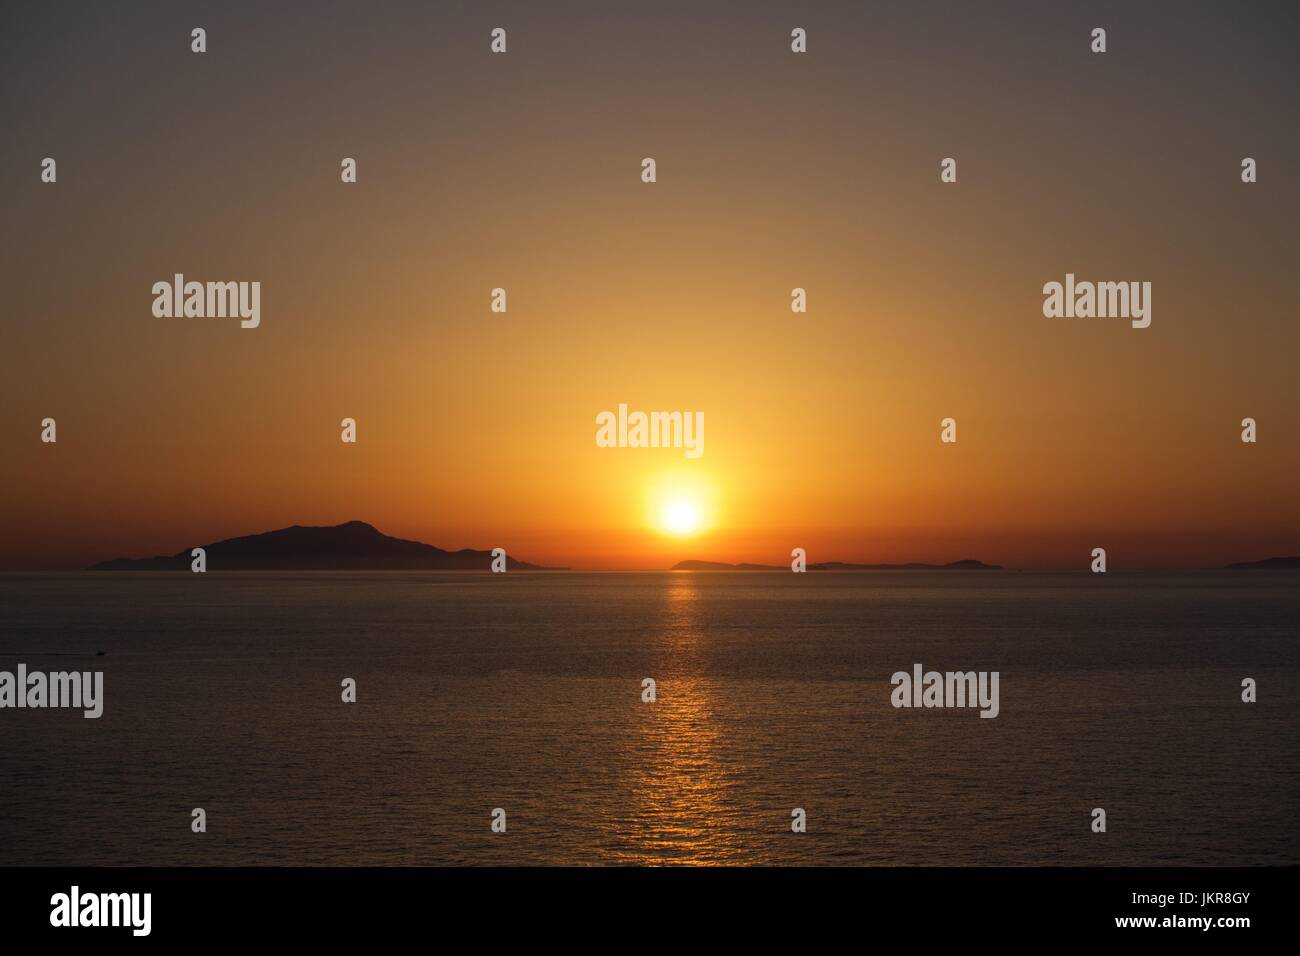 sunset over Ischia - Stock Image